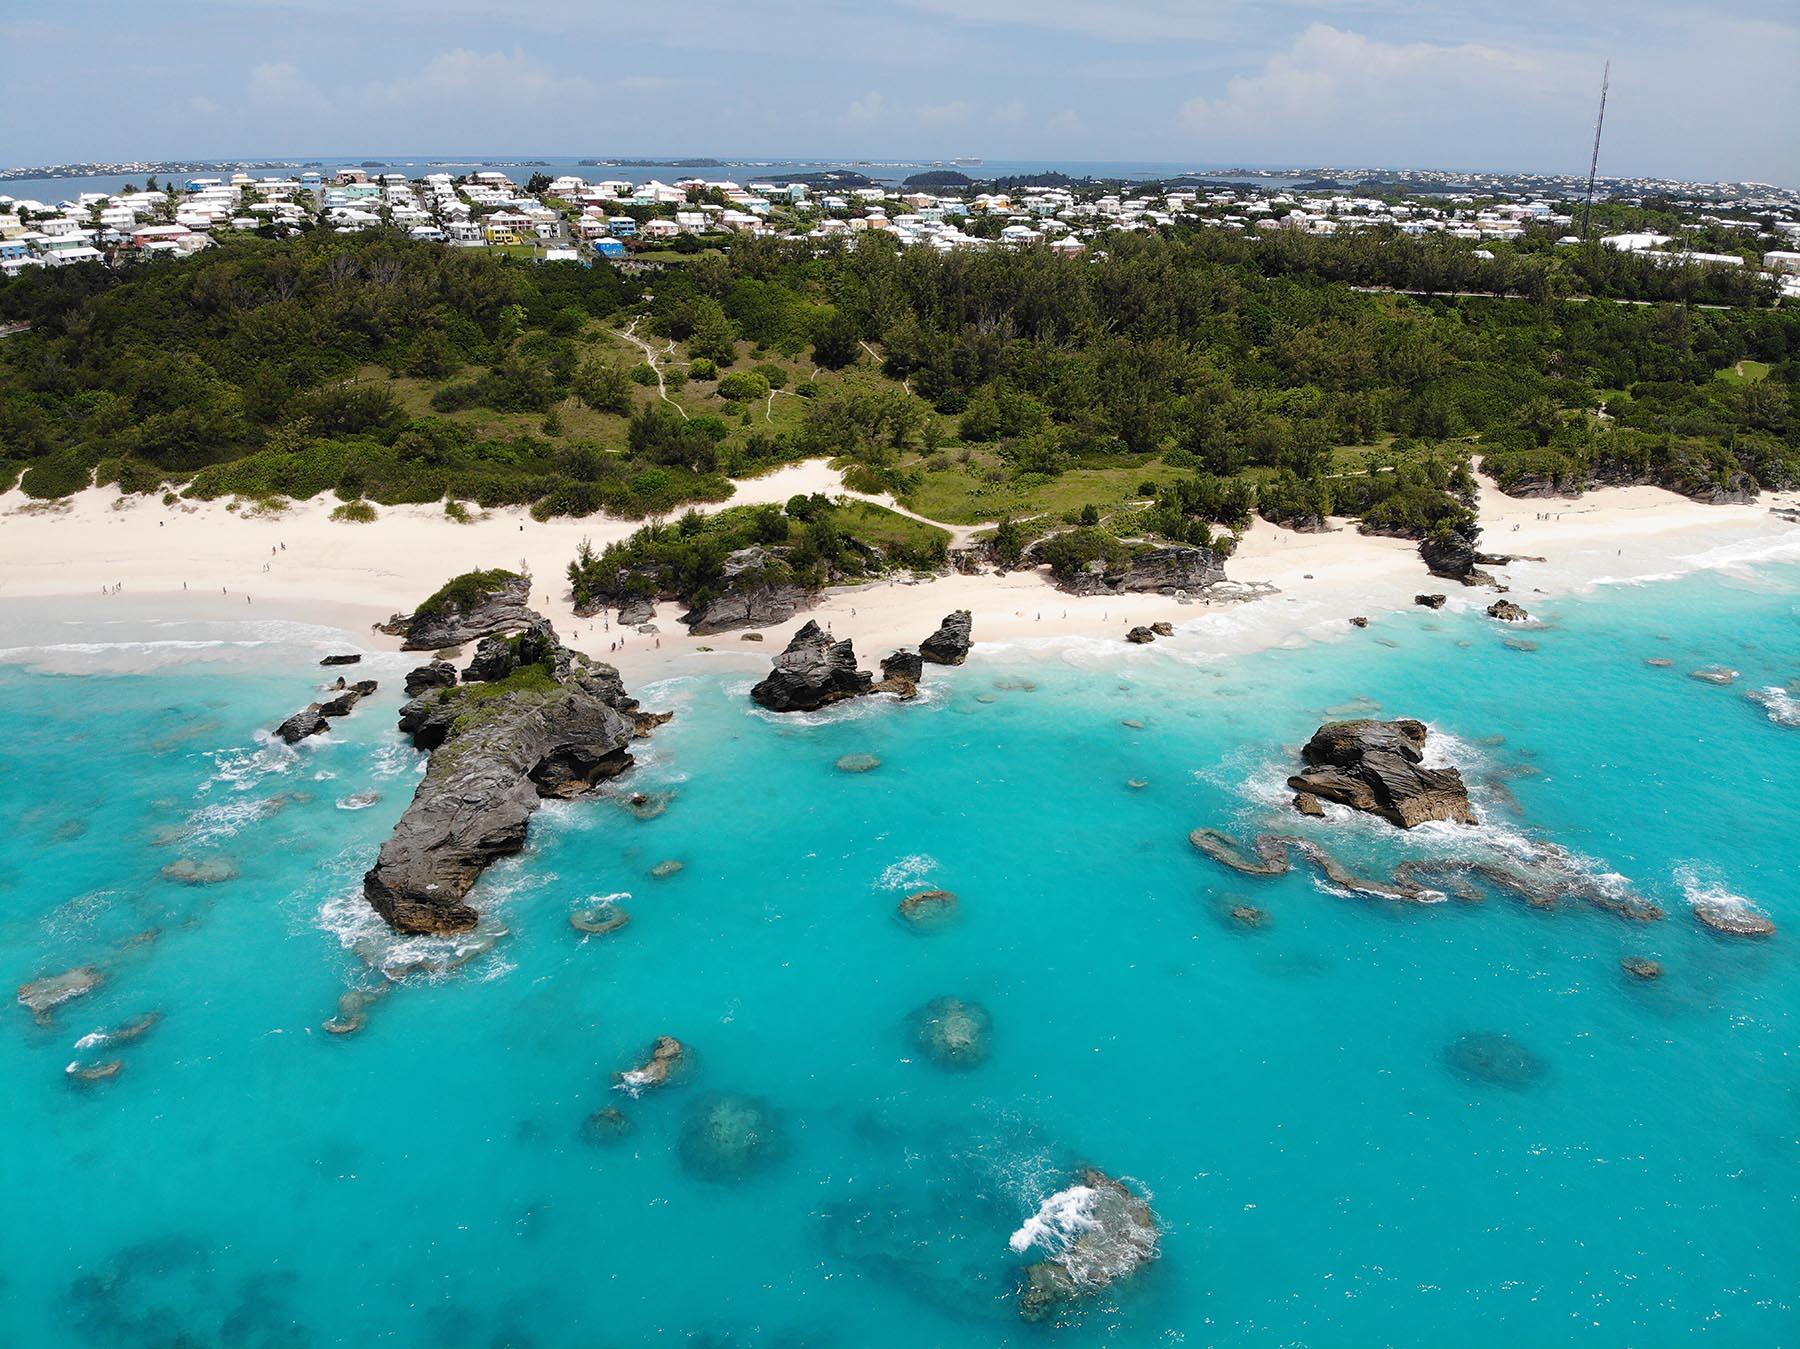 beach in bermuda from above